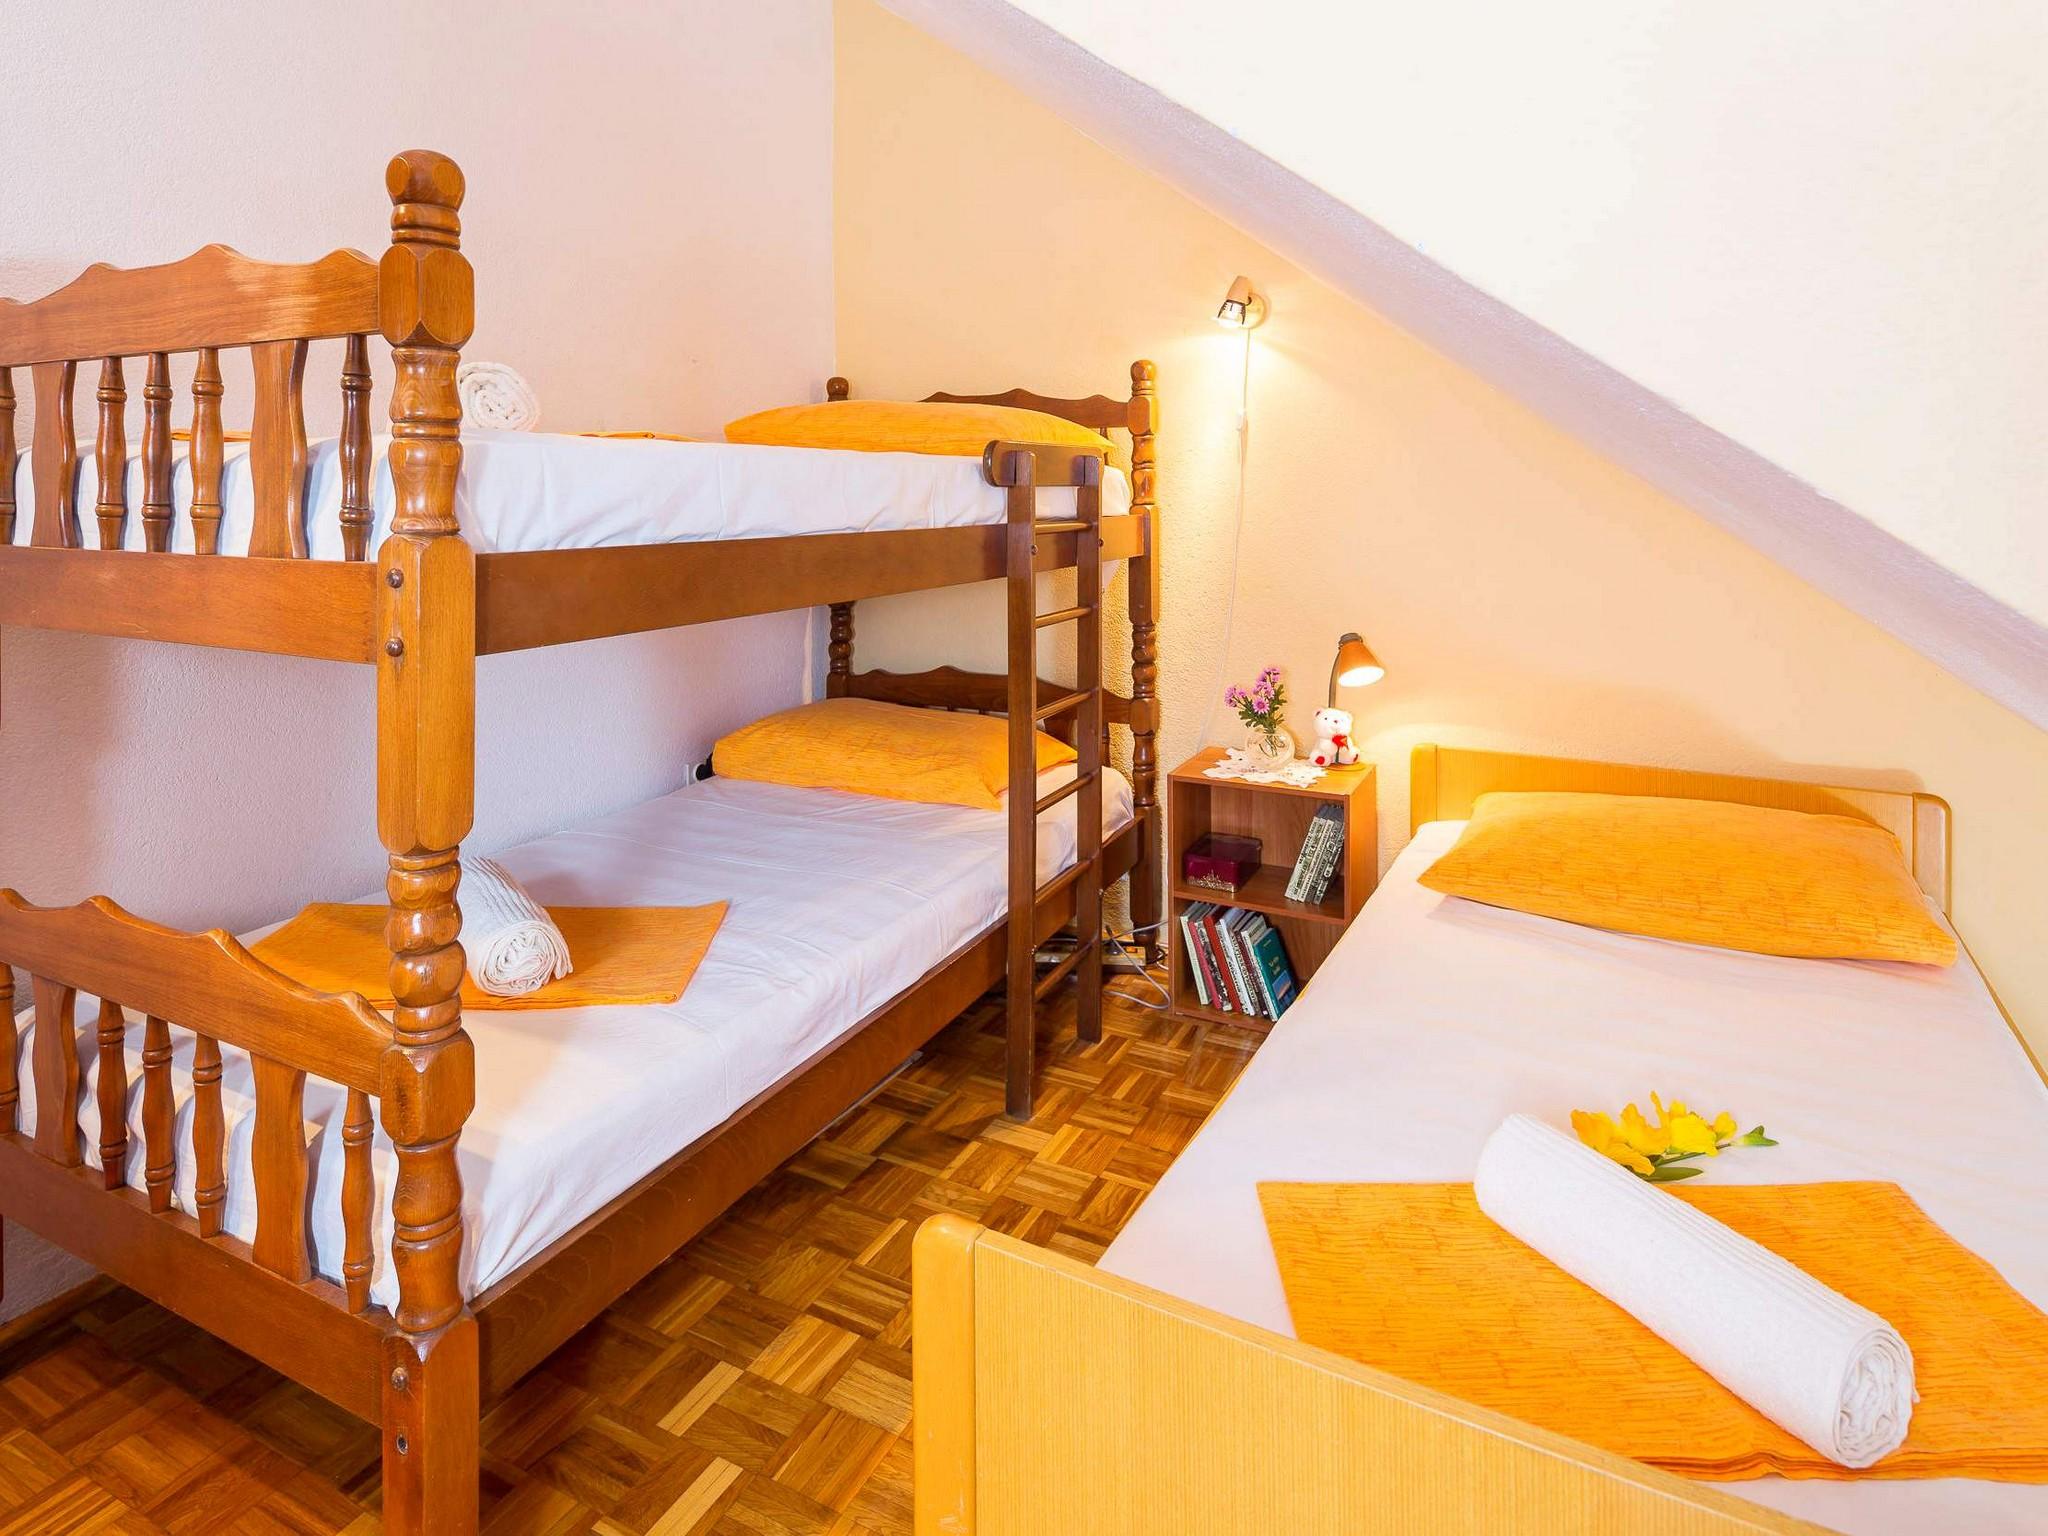 Ferienhaus Tanja, Kua K6+2 (940510), Kanica, , Dalmatien, Kroatien, Bild 26